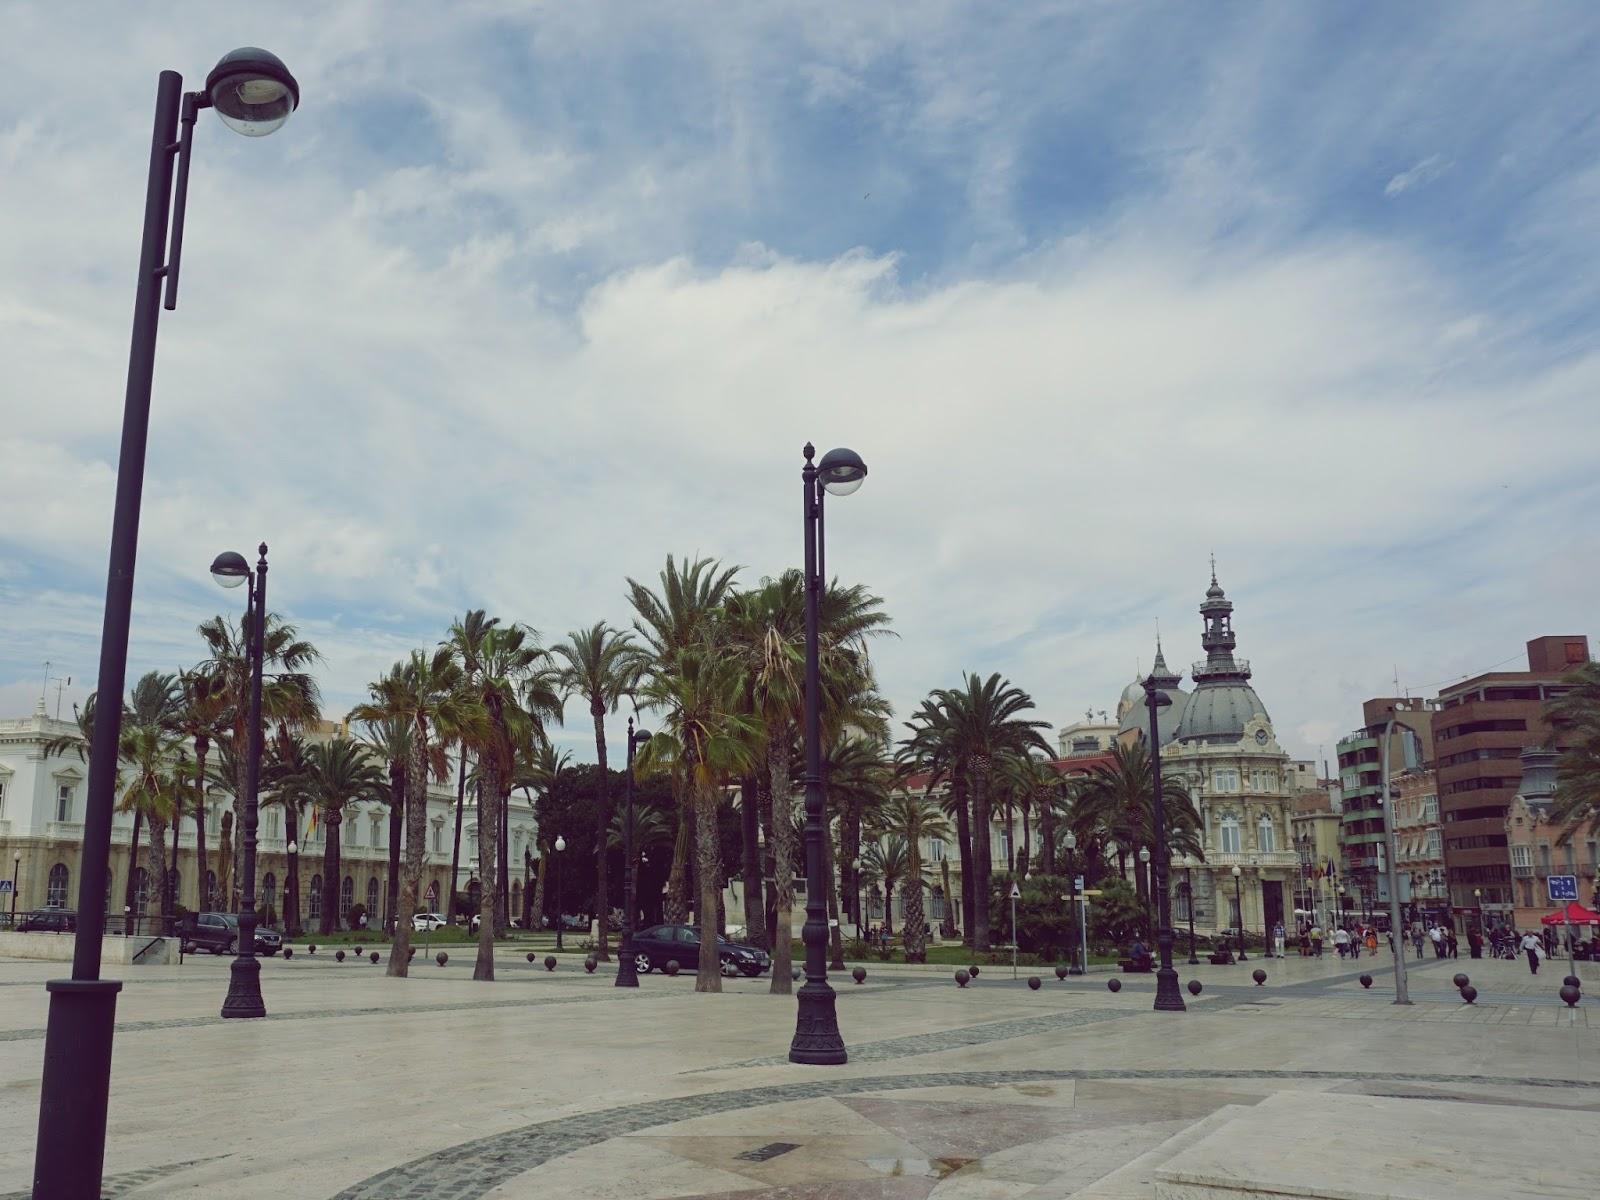 hiszpańskie miasto, Kartagena, panidorcia, blog, Hiszpania, podróże